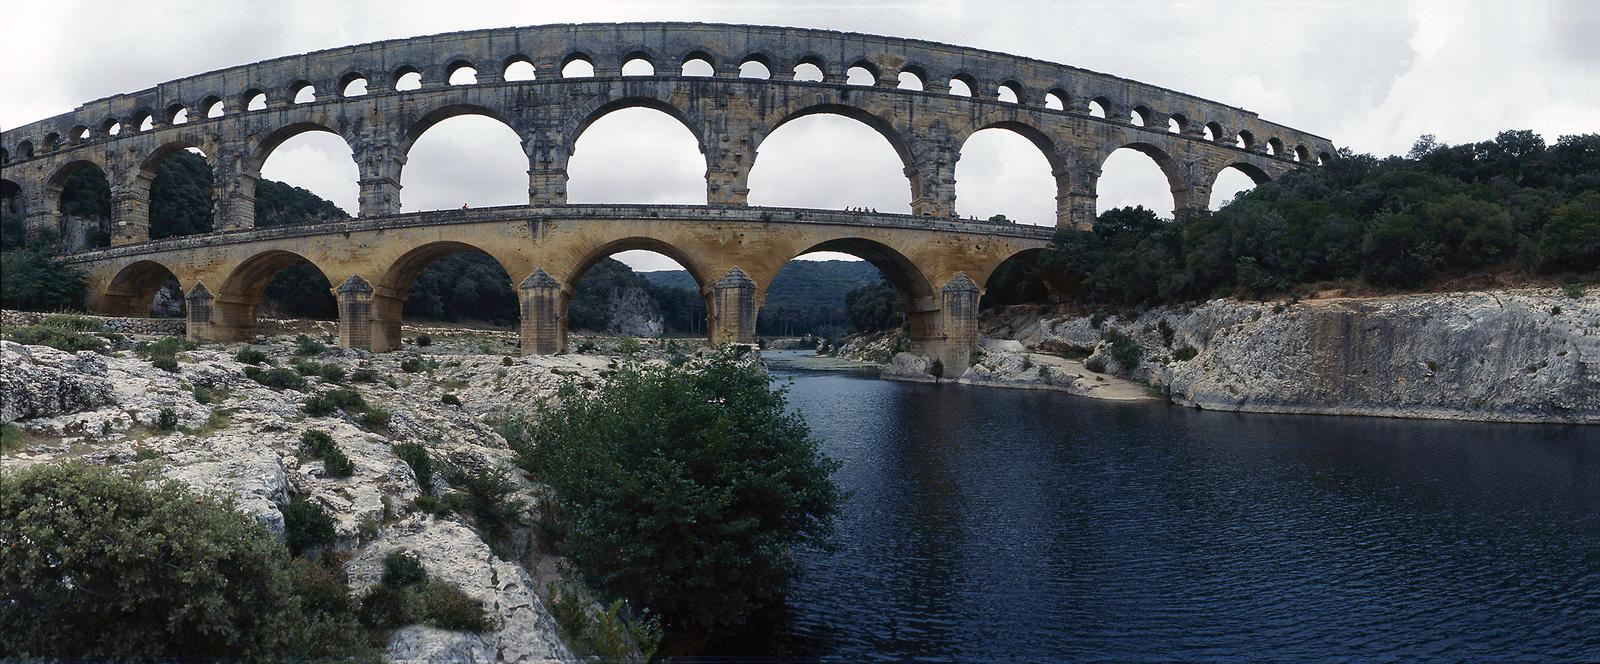 sm33: Pont du Gard pano